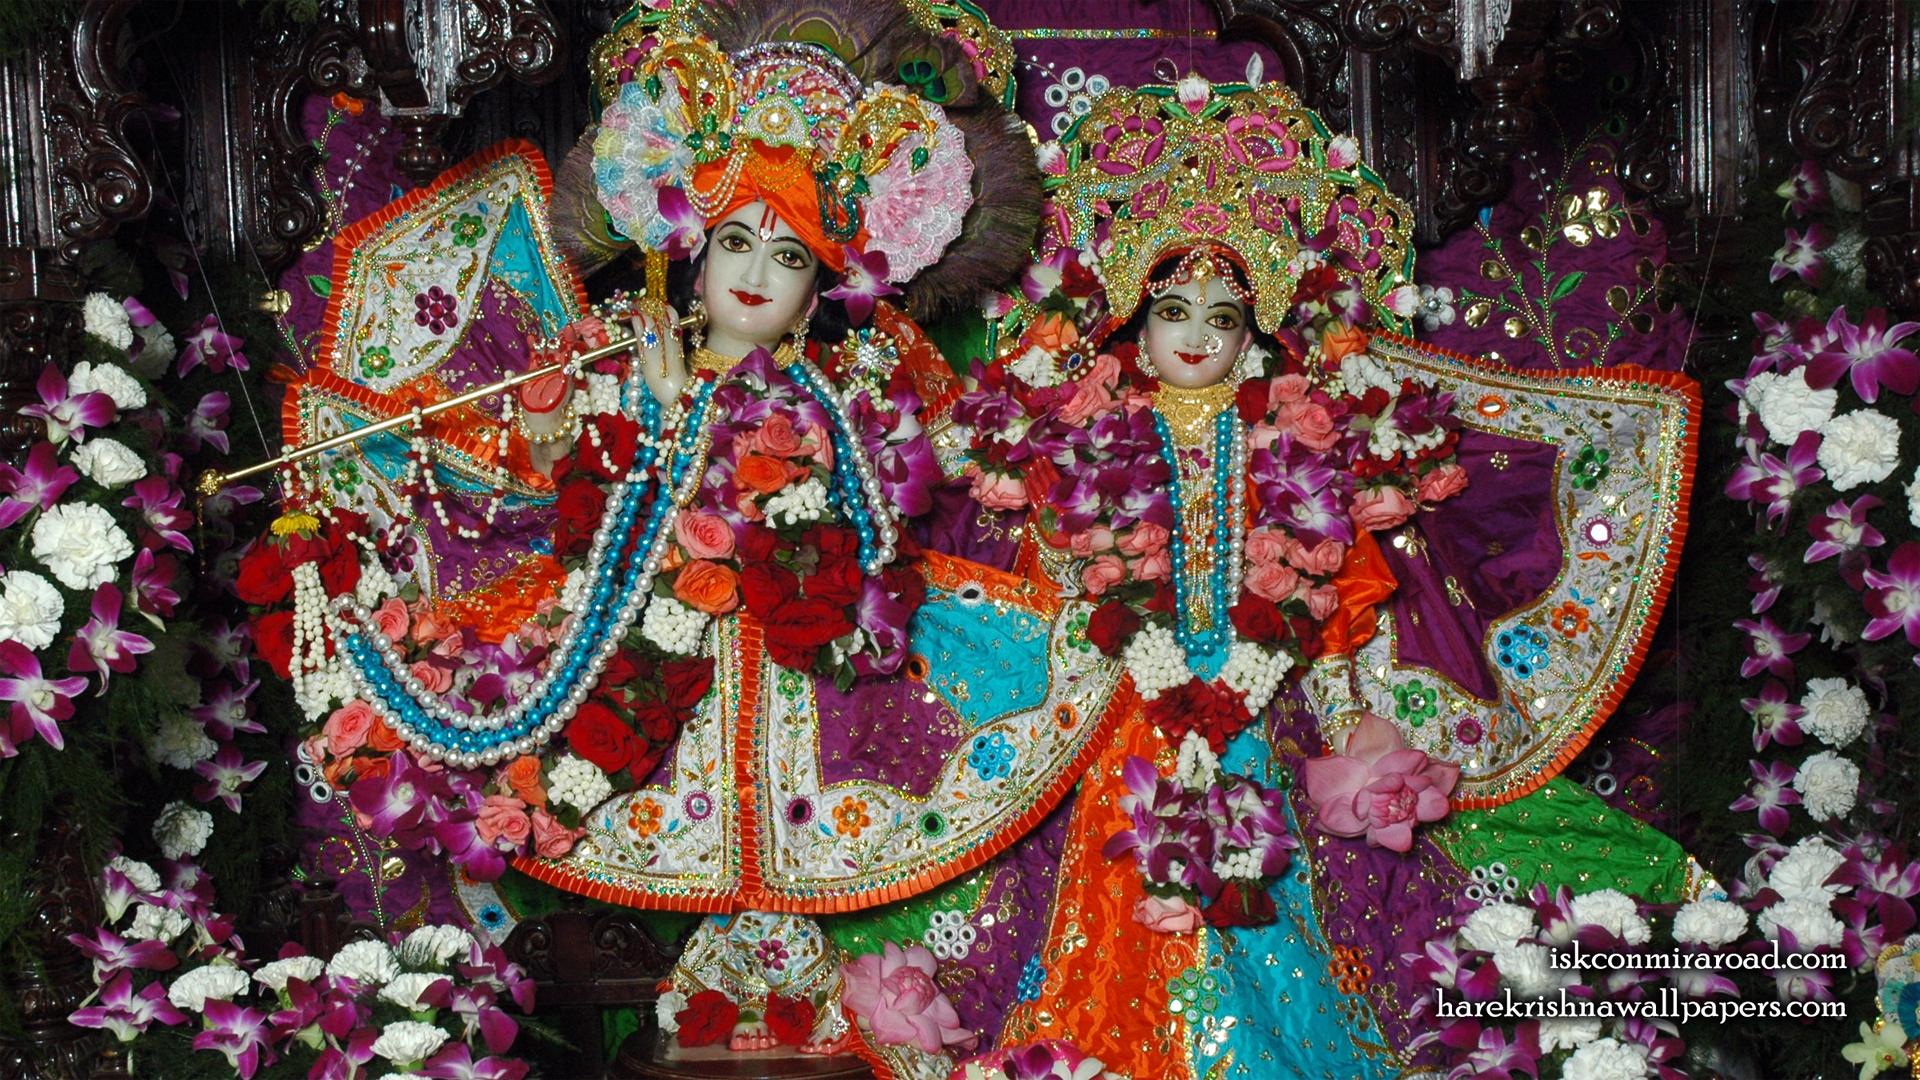 Sri Sri Radha Giridhari Wallpaper (016) Size 1920x1080 Download